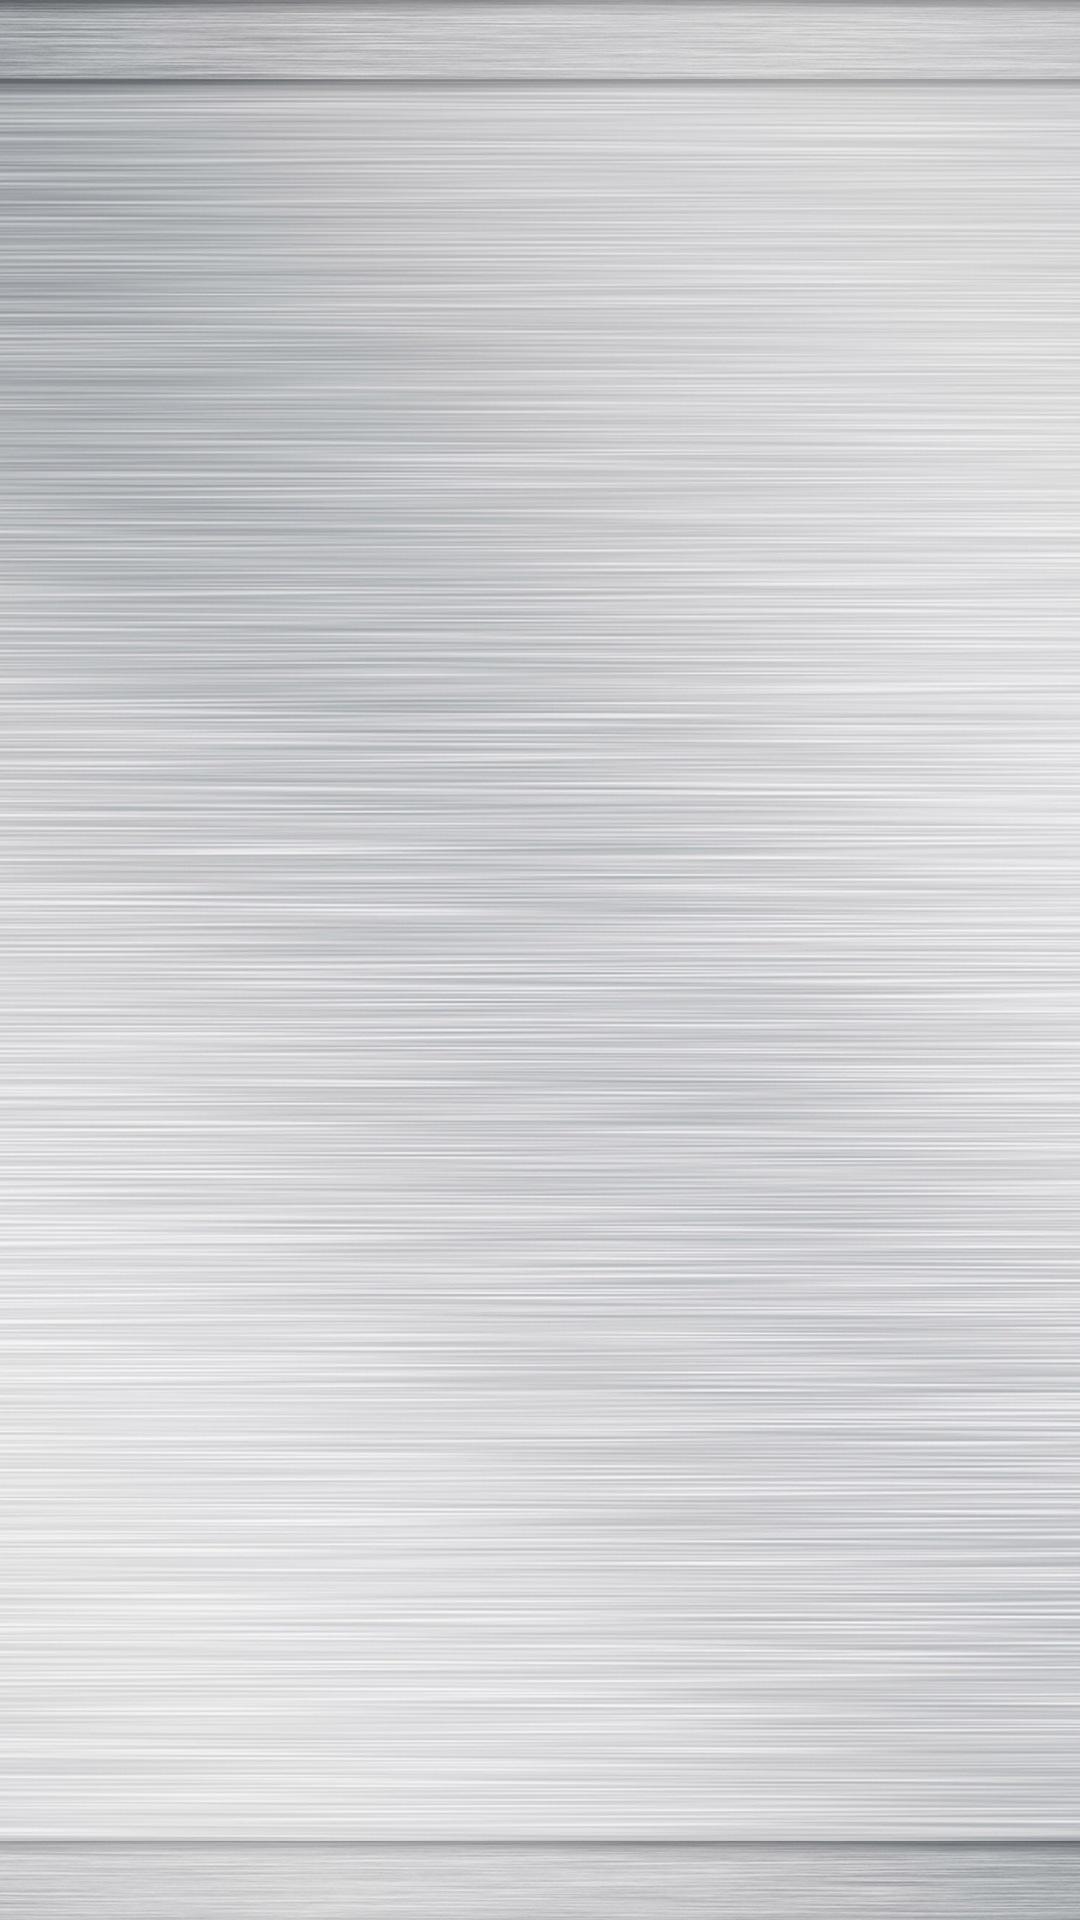 Brushed Aluminium Horizontal Texture Cool Android Wallpaper 1080x1920